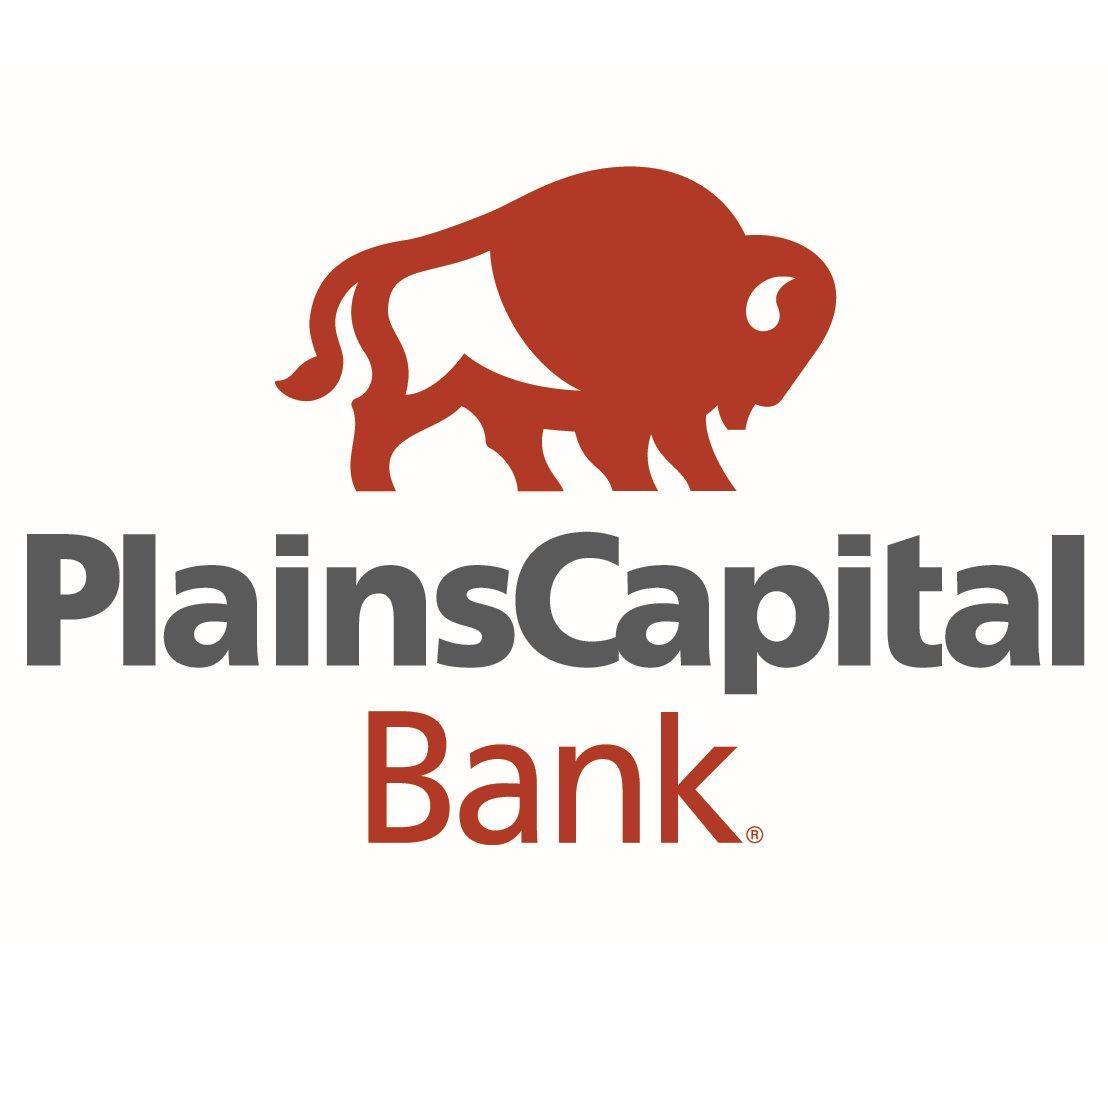 PlainsCapital Bank